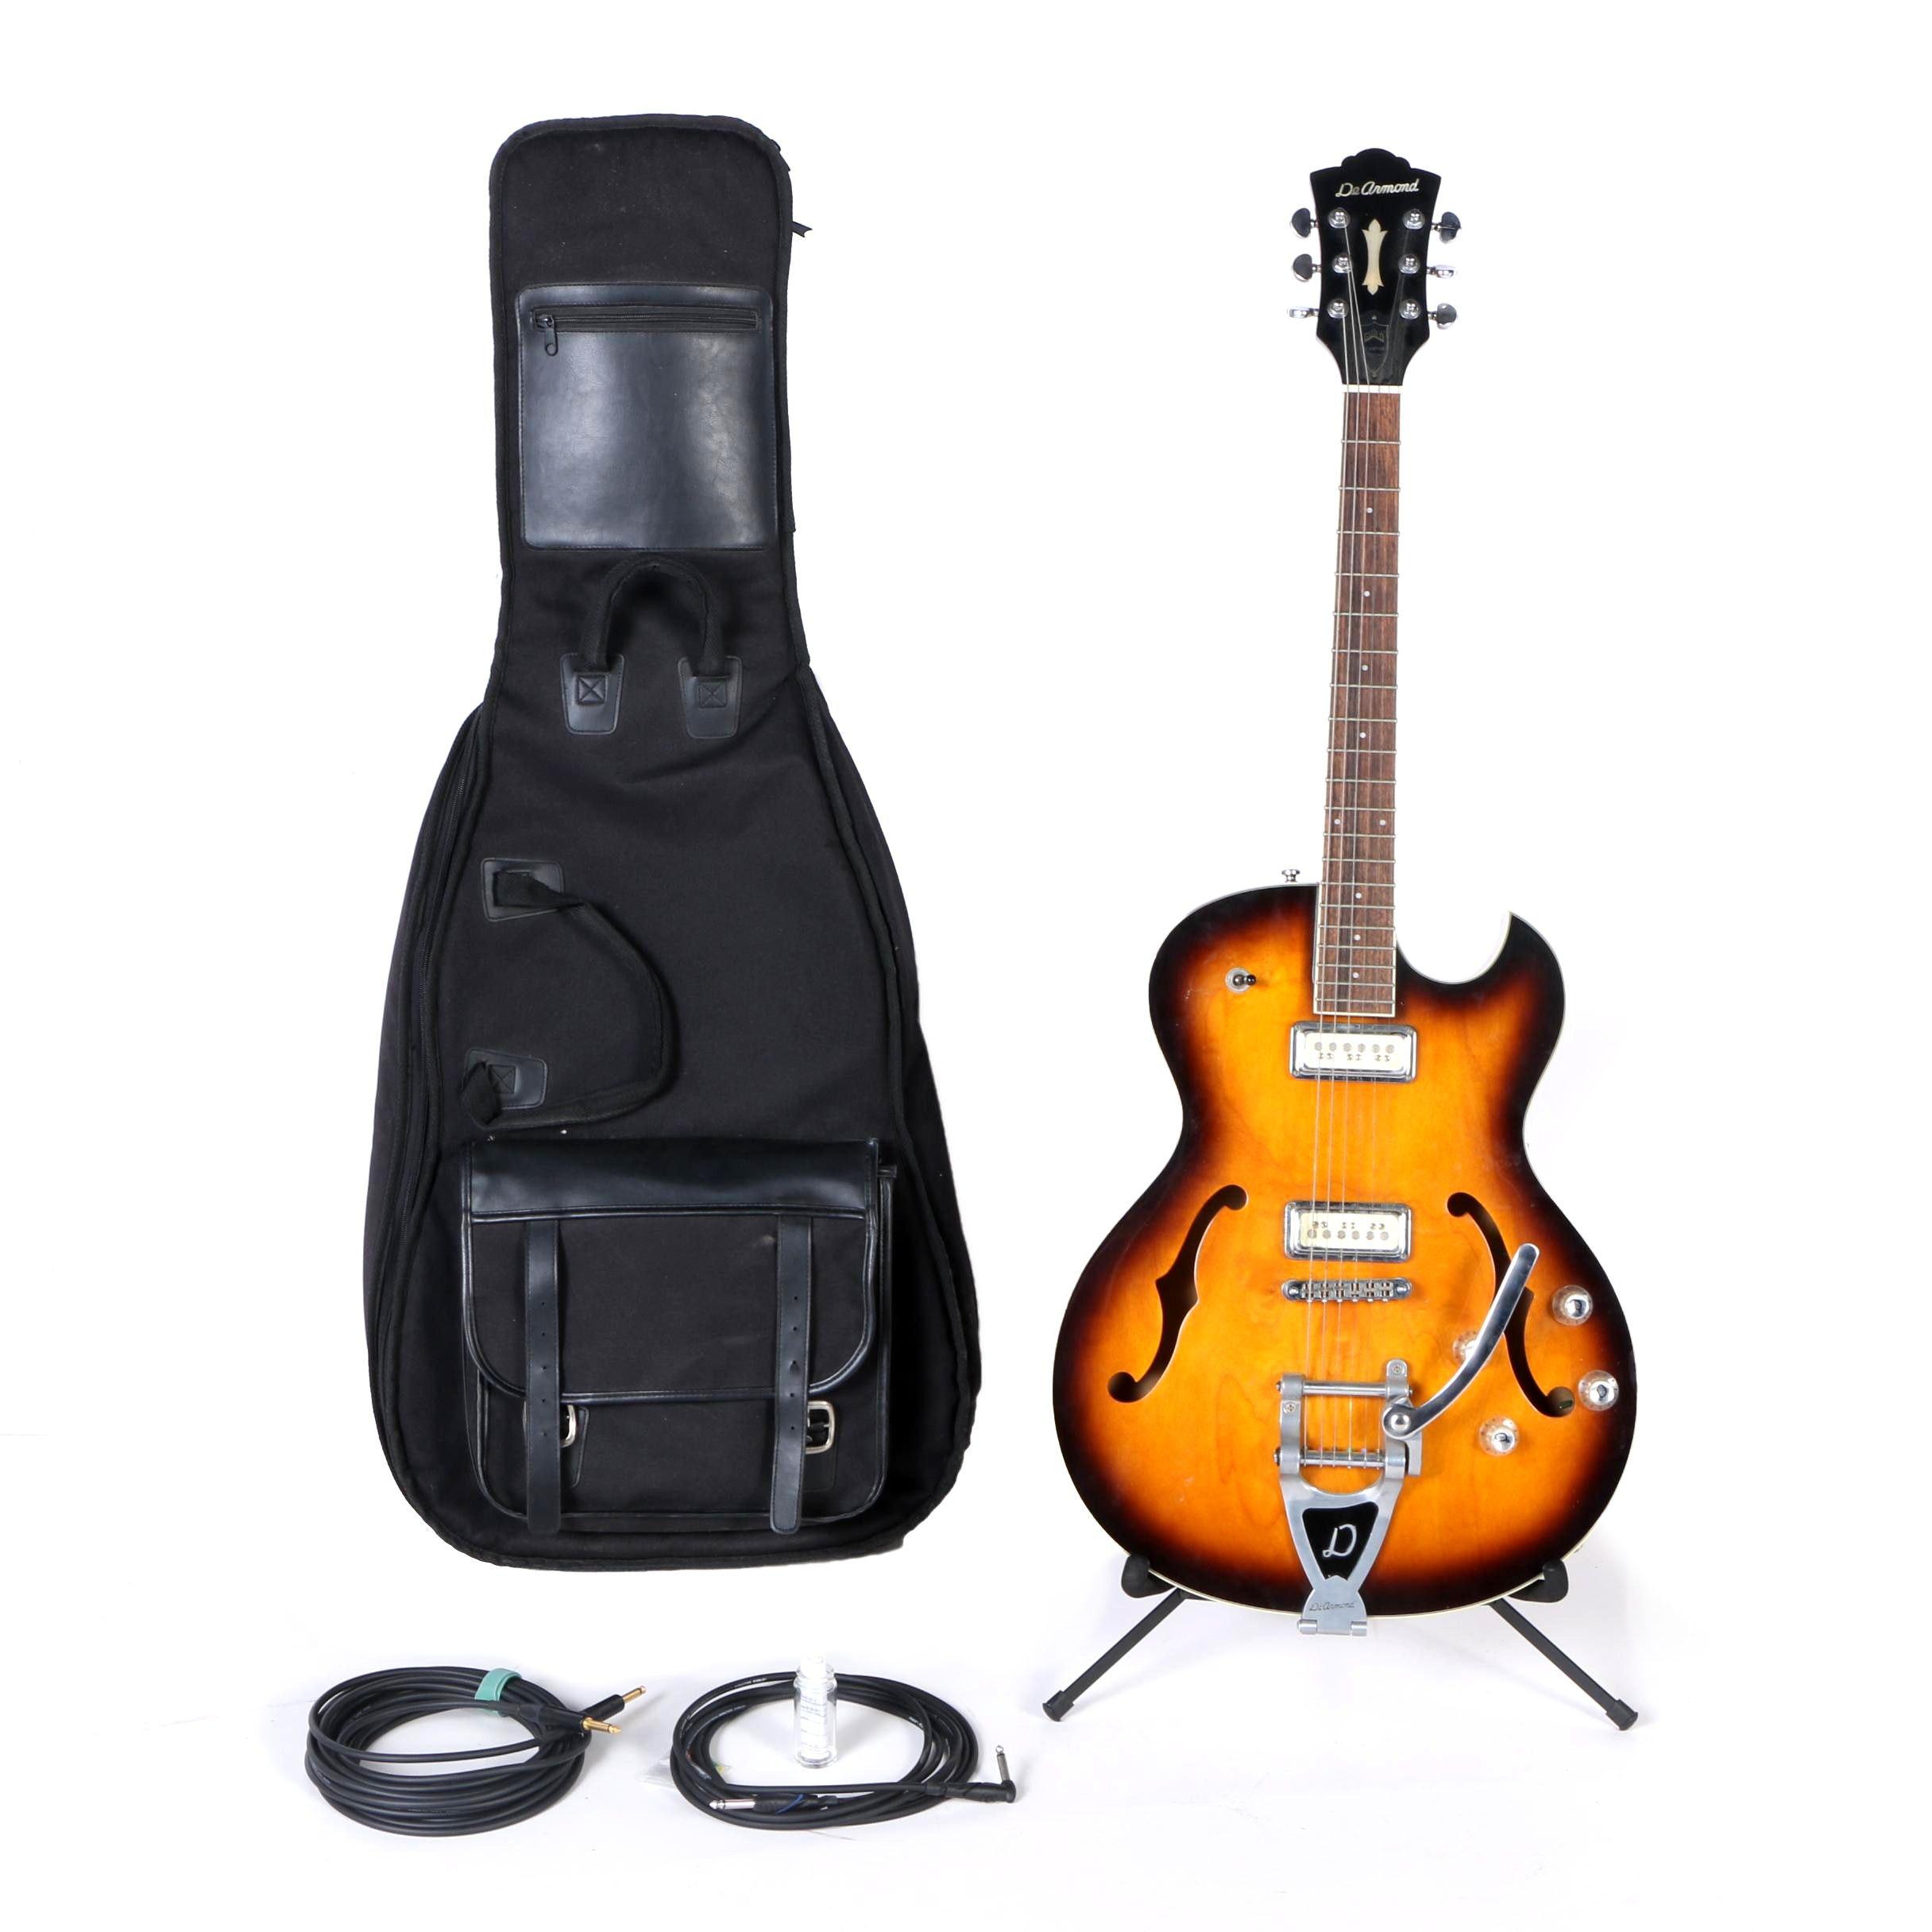 Guild DeArmond Starfire Semi-Hollow Body Electric Guitar and Accessories